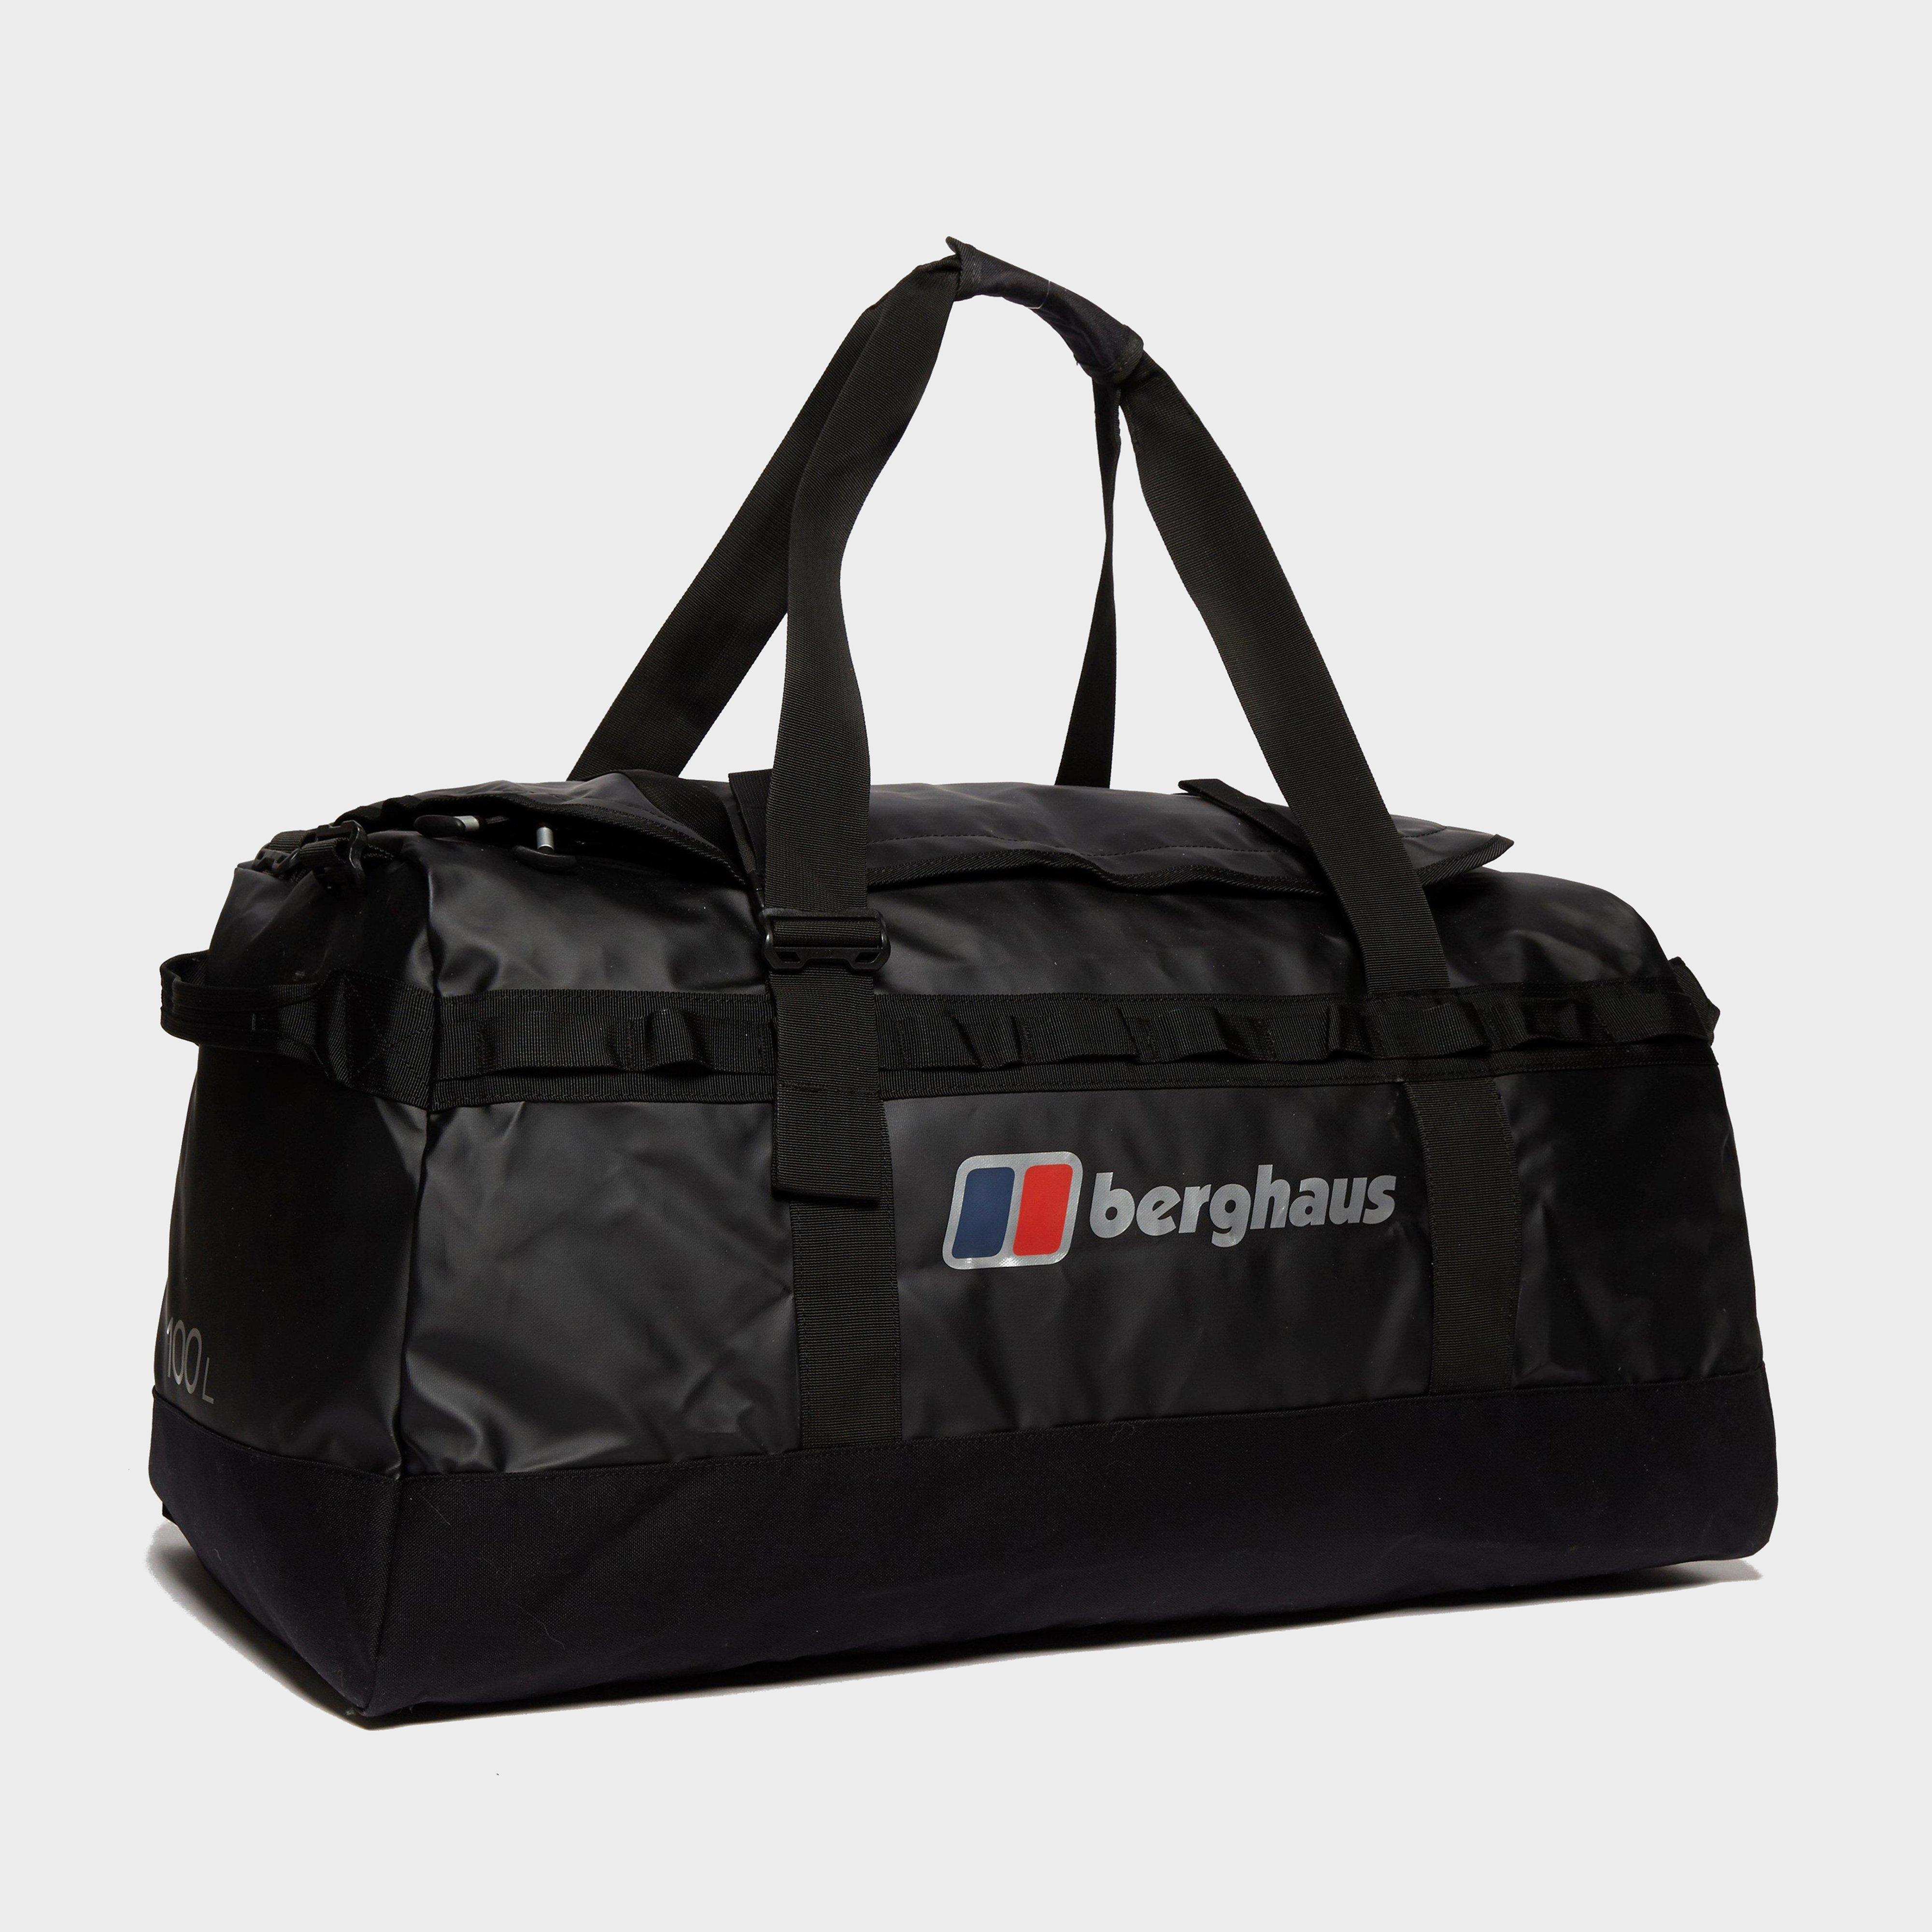 Berghaus 100L Holdall Black